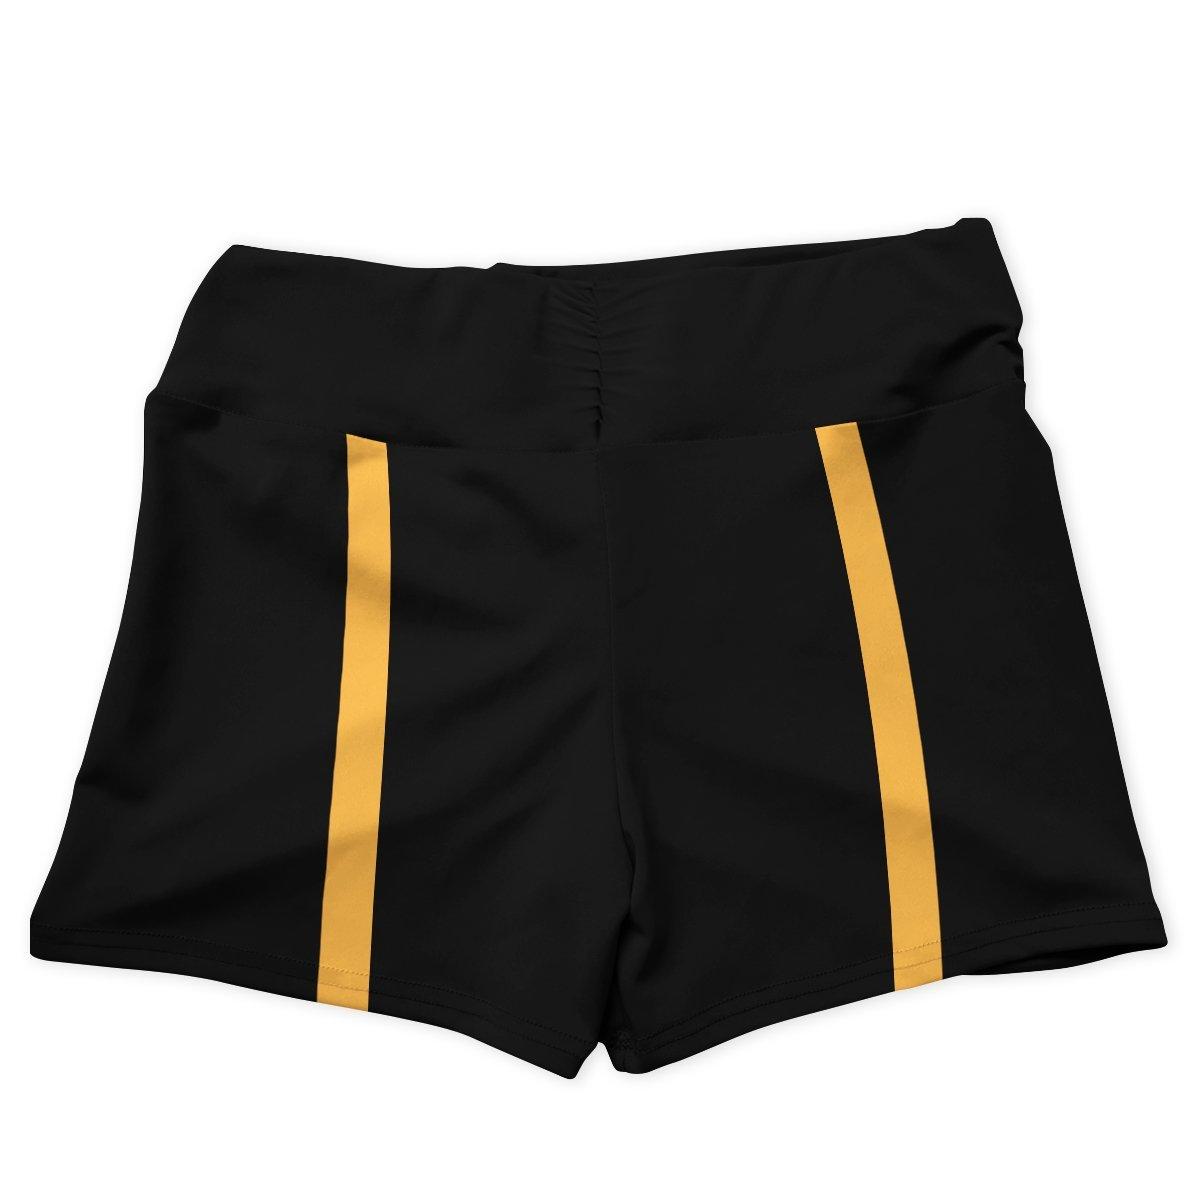 re zero subaru natsuki active wear set 116641 - Anime Swimsuits